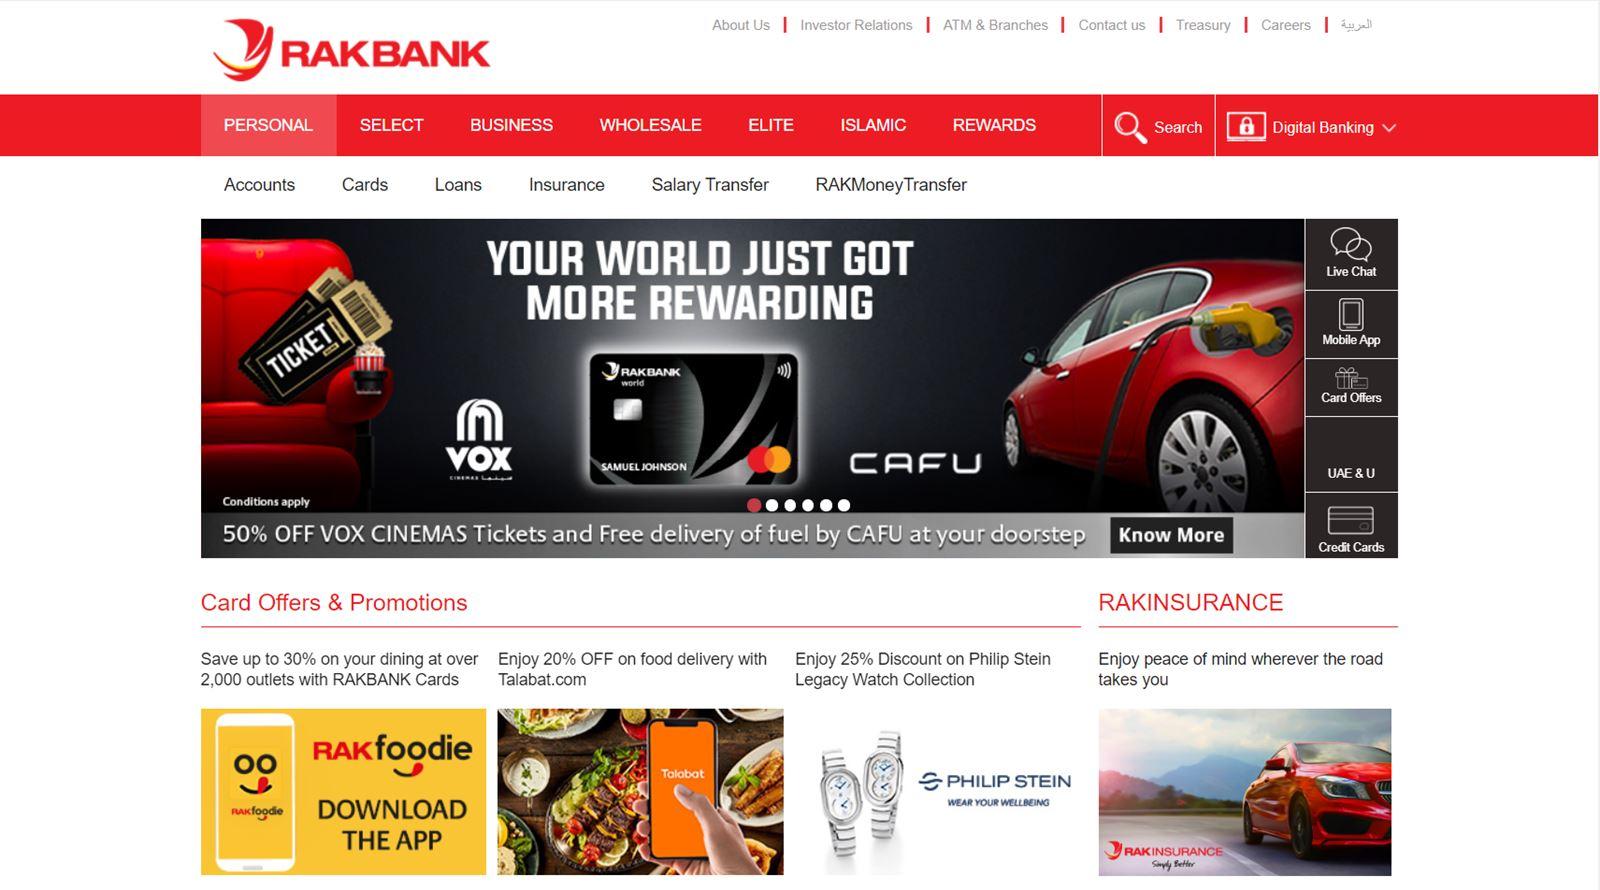 rakbank website